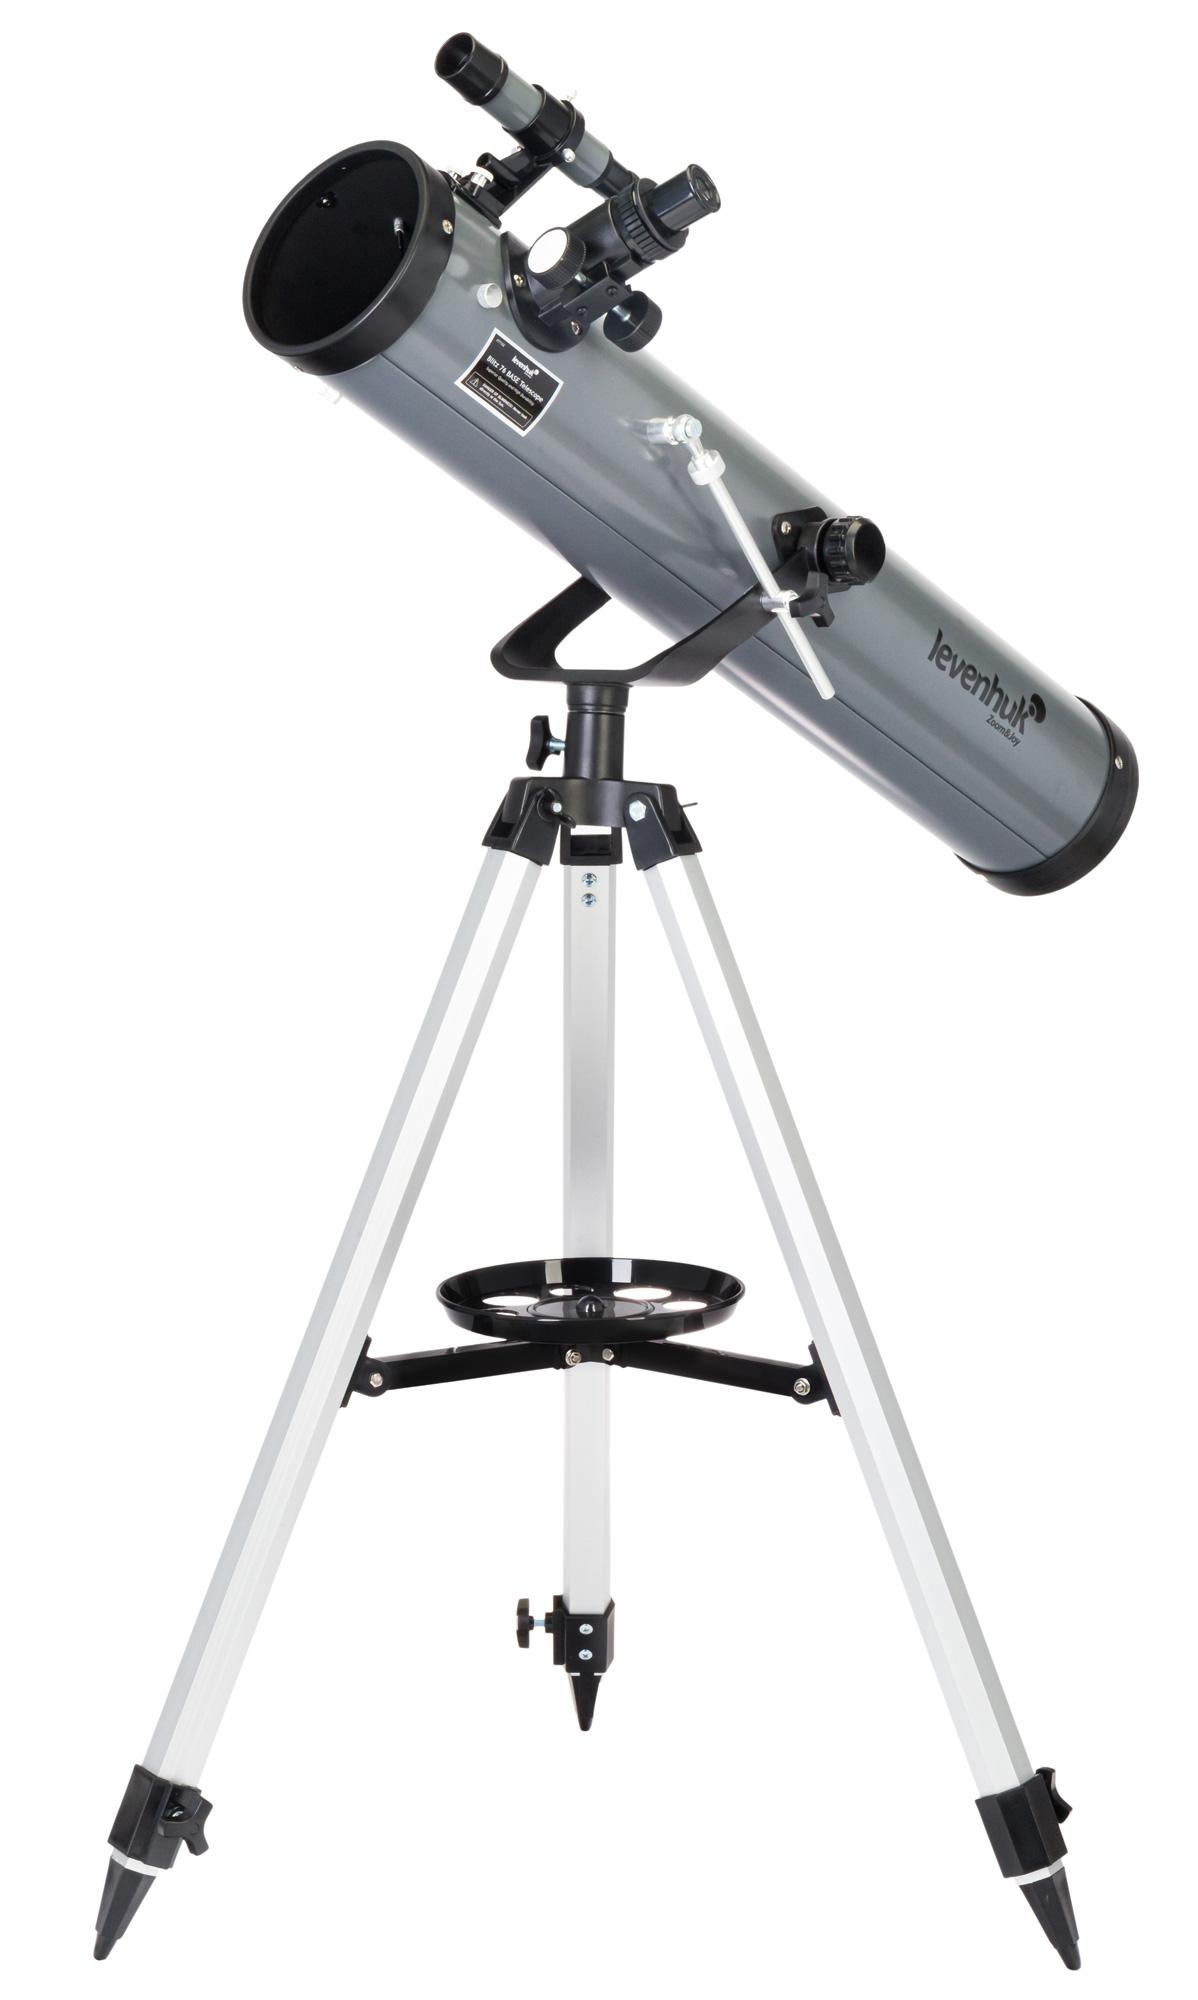 Картинка для Телескоп Levenhuk (Левенгук) Blitz 76 BASE